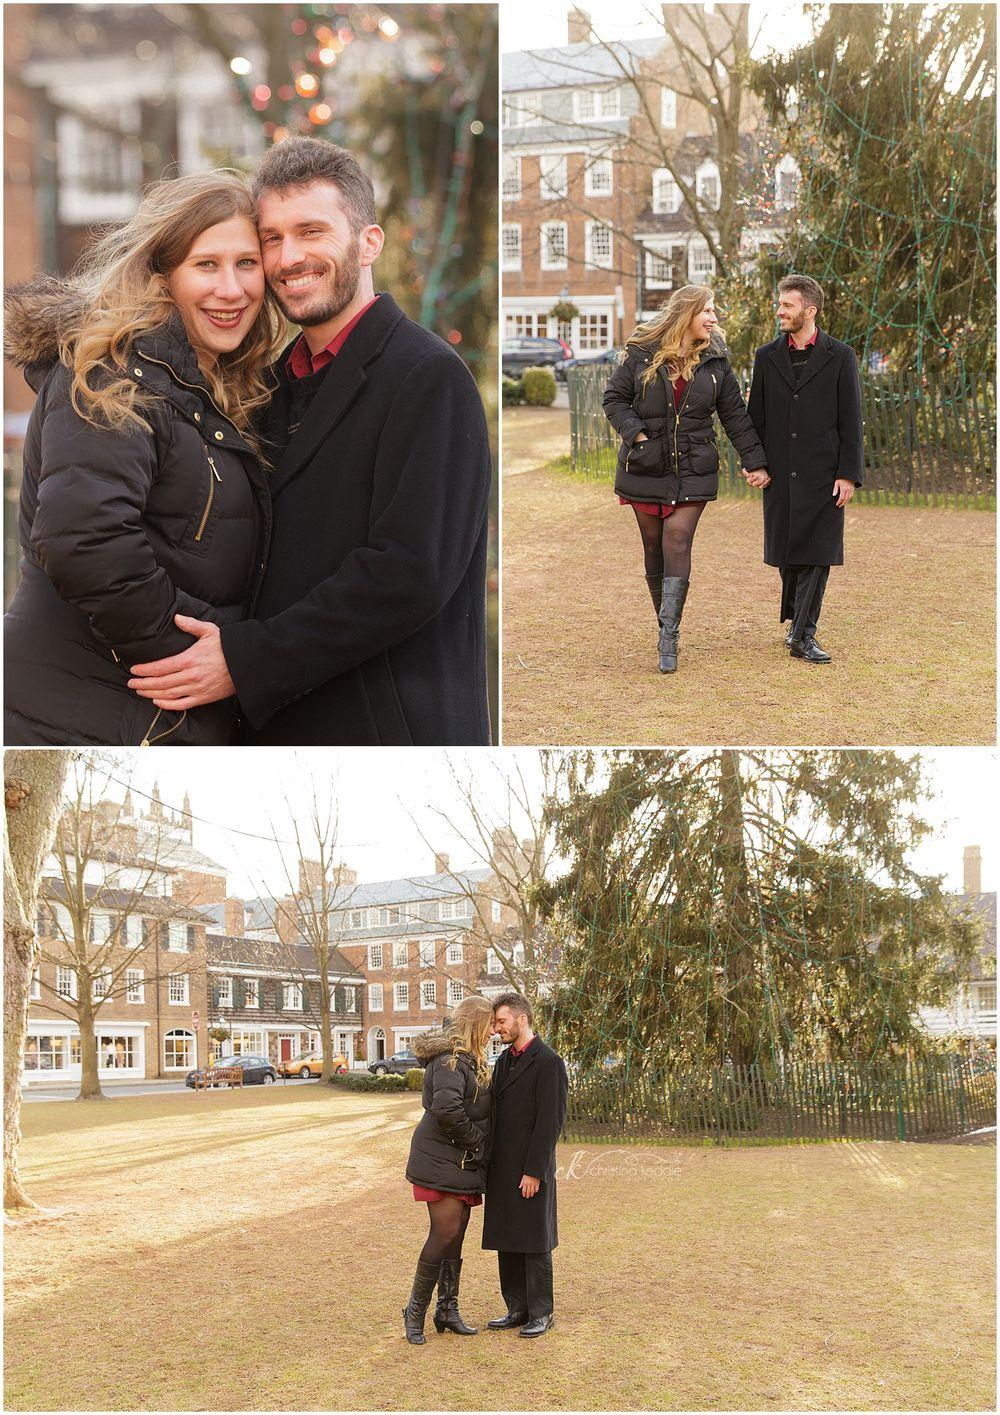 Winter engagement portraits in town square | Christina Keddie Photography | Princeton NJ engagement photographer